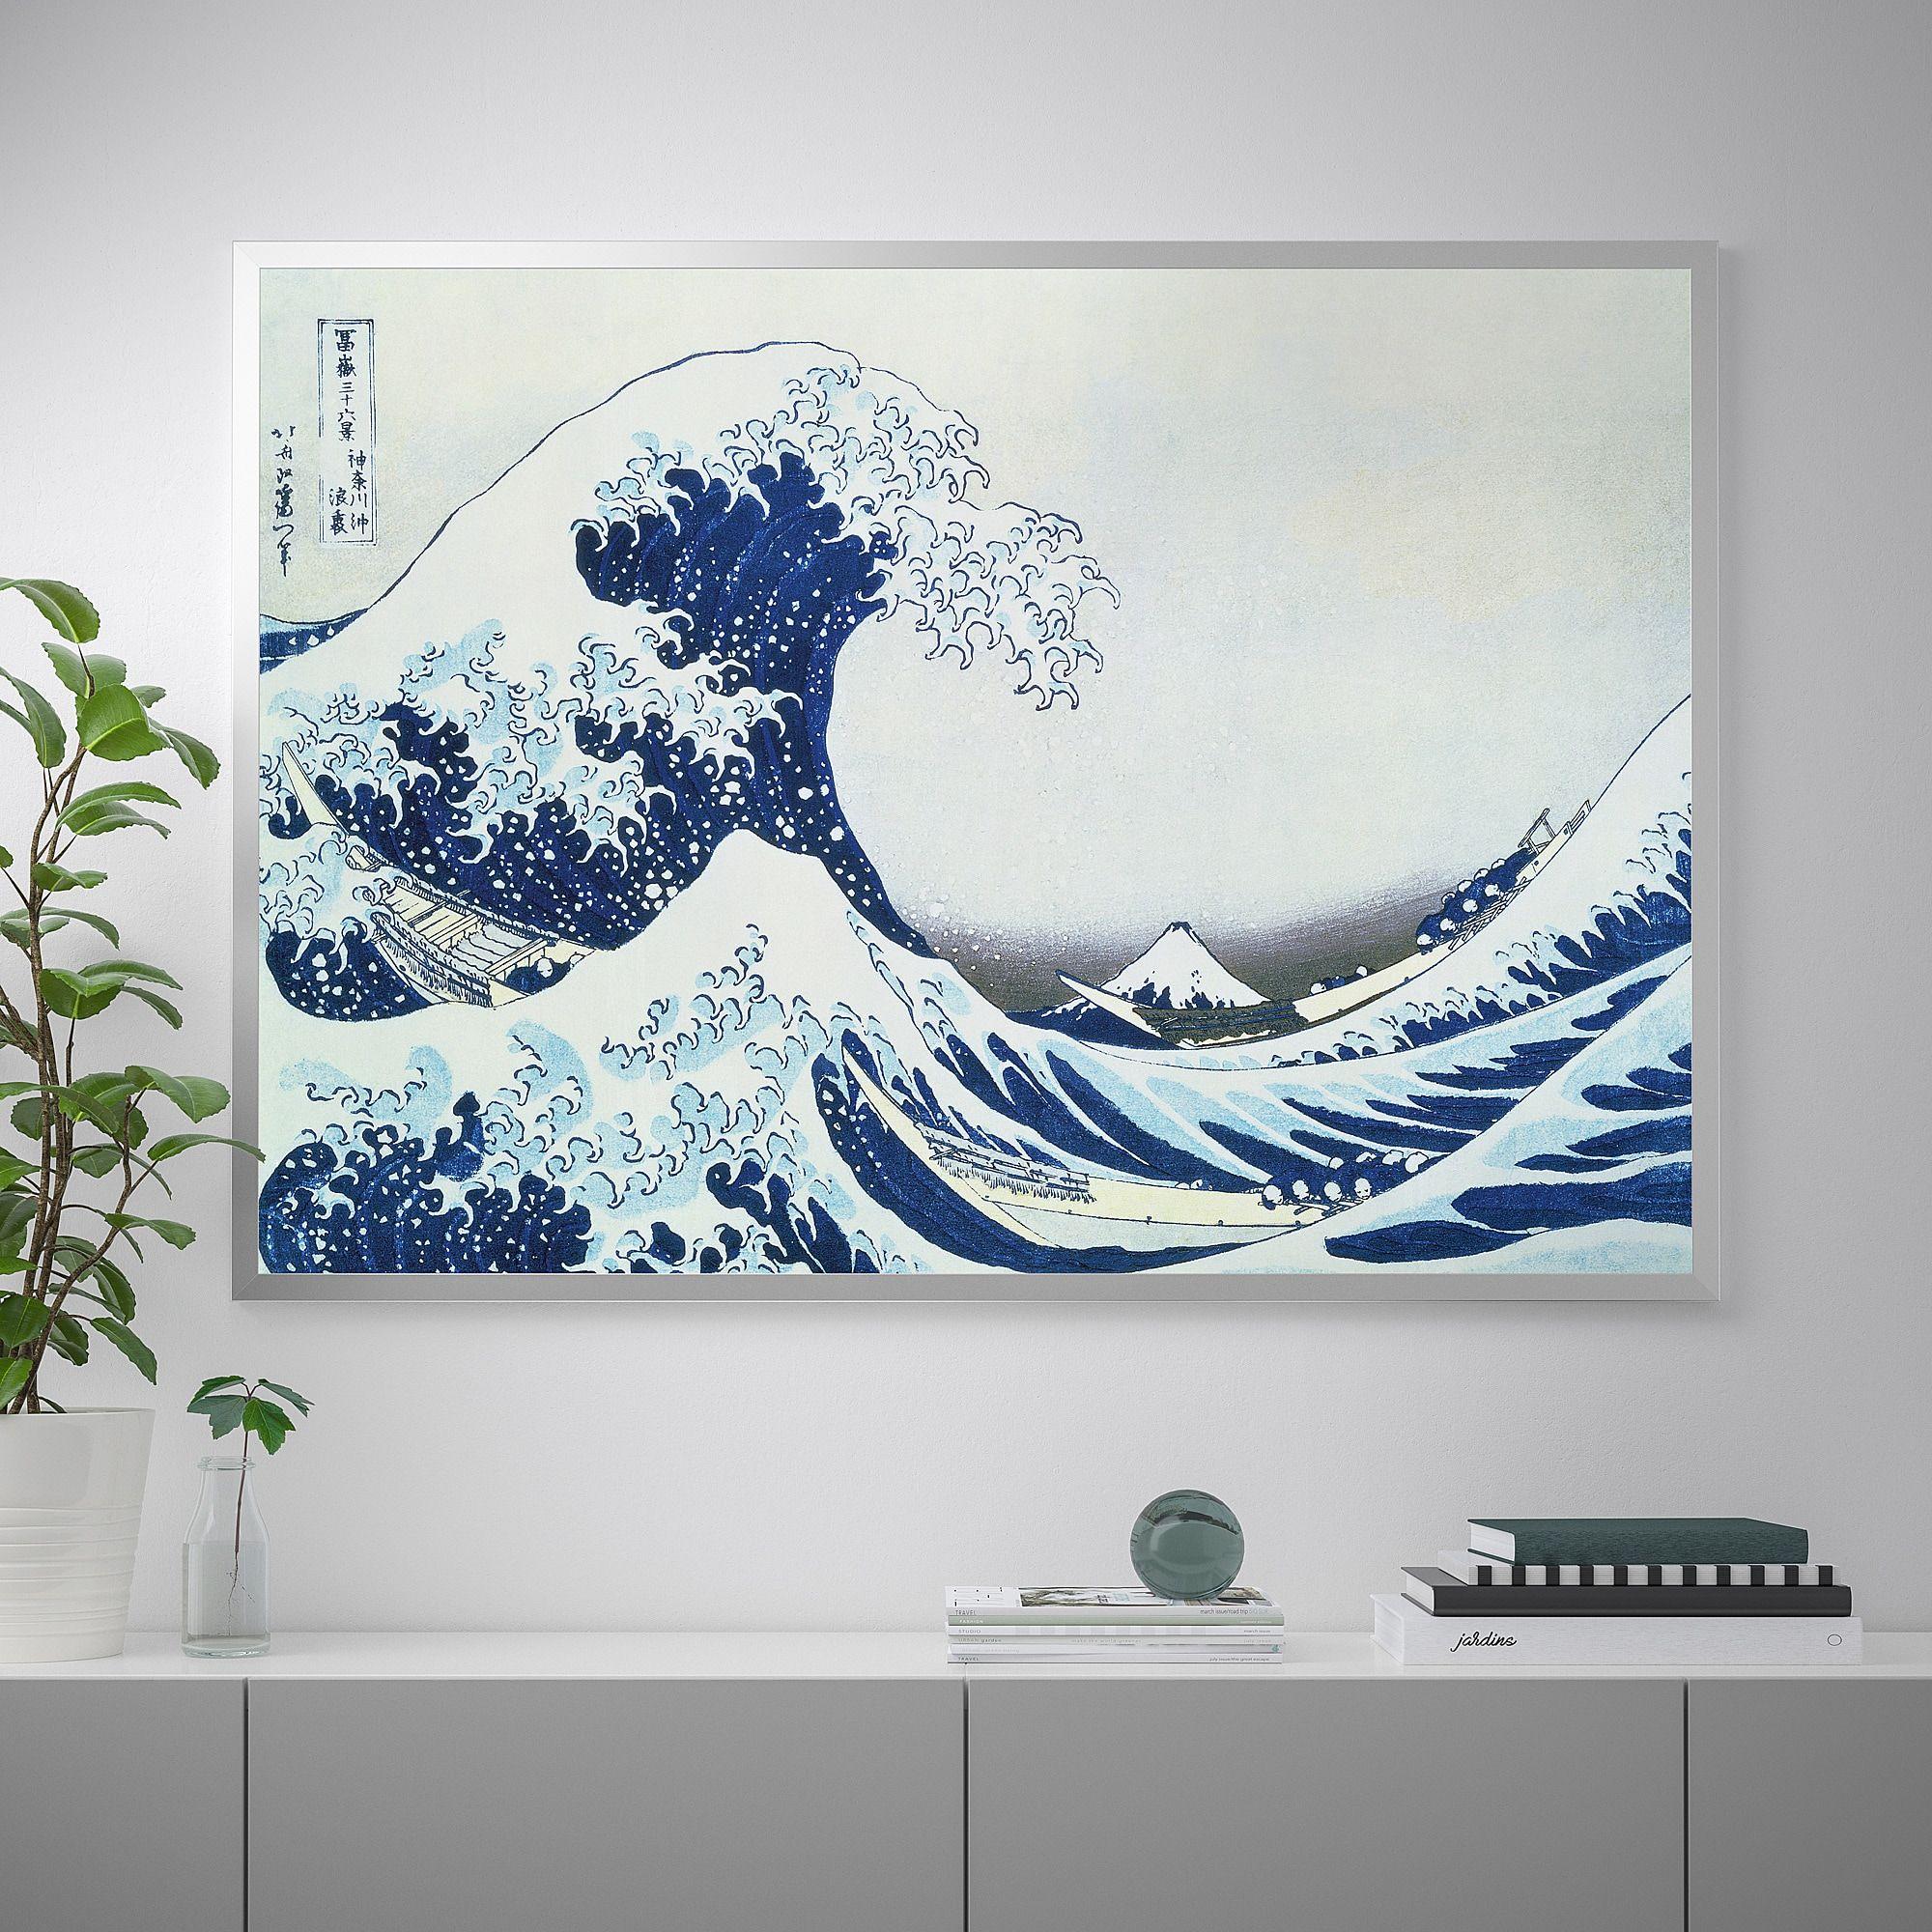 Cartina Mondo Ikea.Ikea Us Furniture And Home Furnishings Japanese Waves Japanese Wave Painting Wave Painting